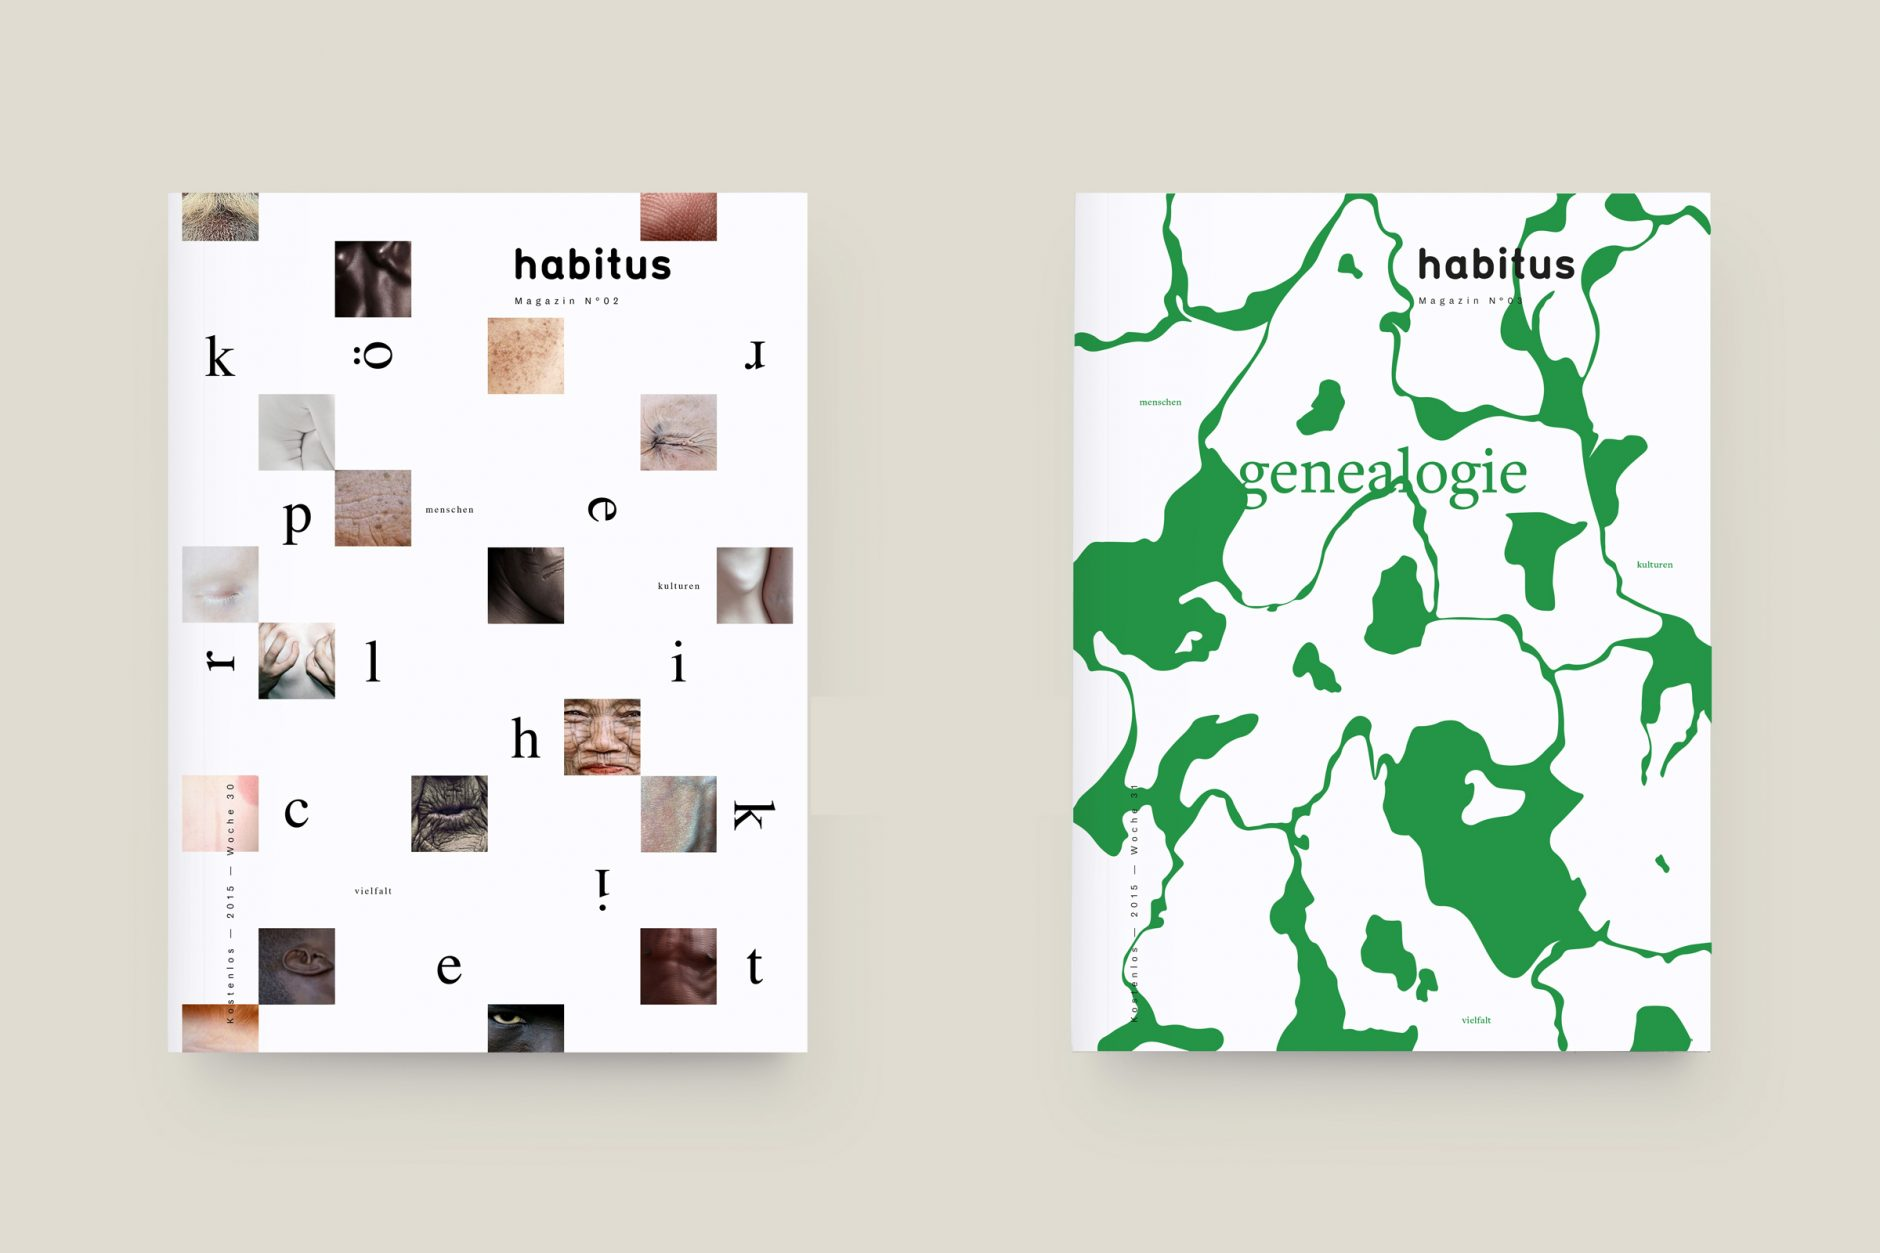 habitusmagazin_2